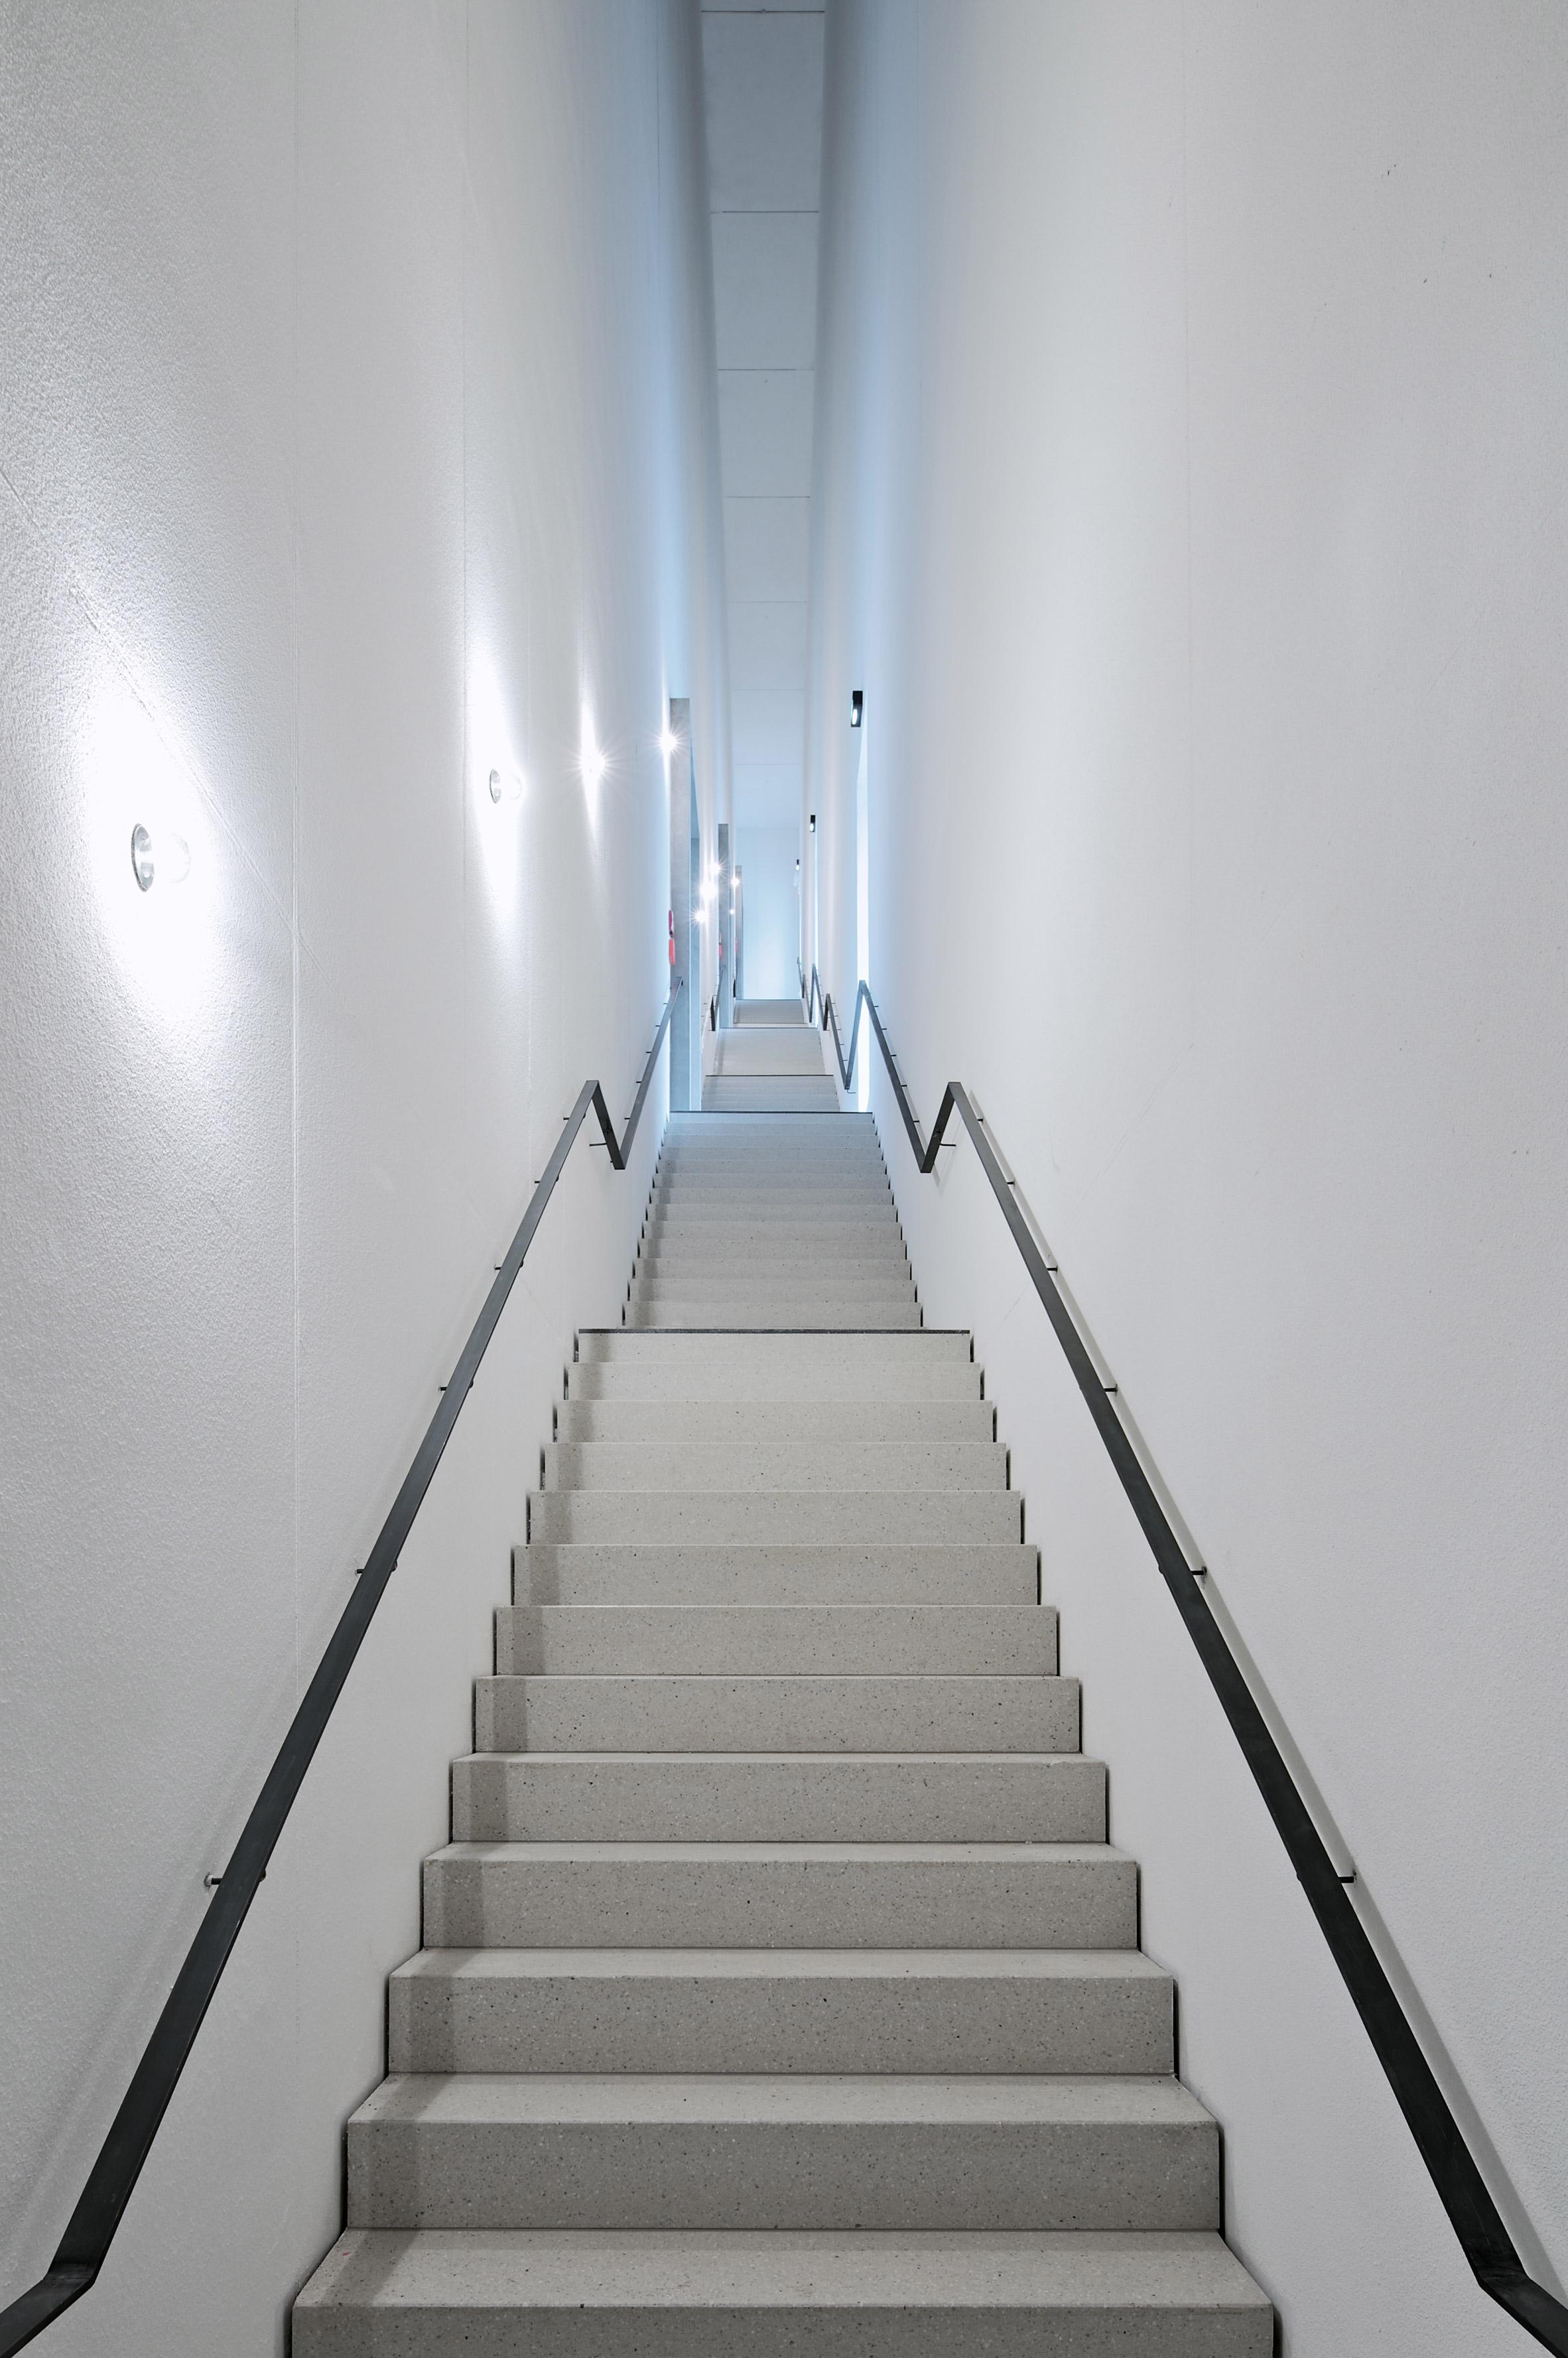 Bauhaus Museum Weimar by Heike Hanada